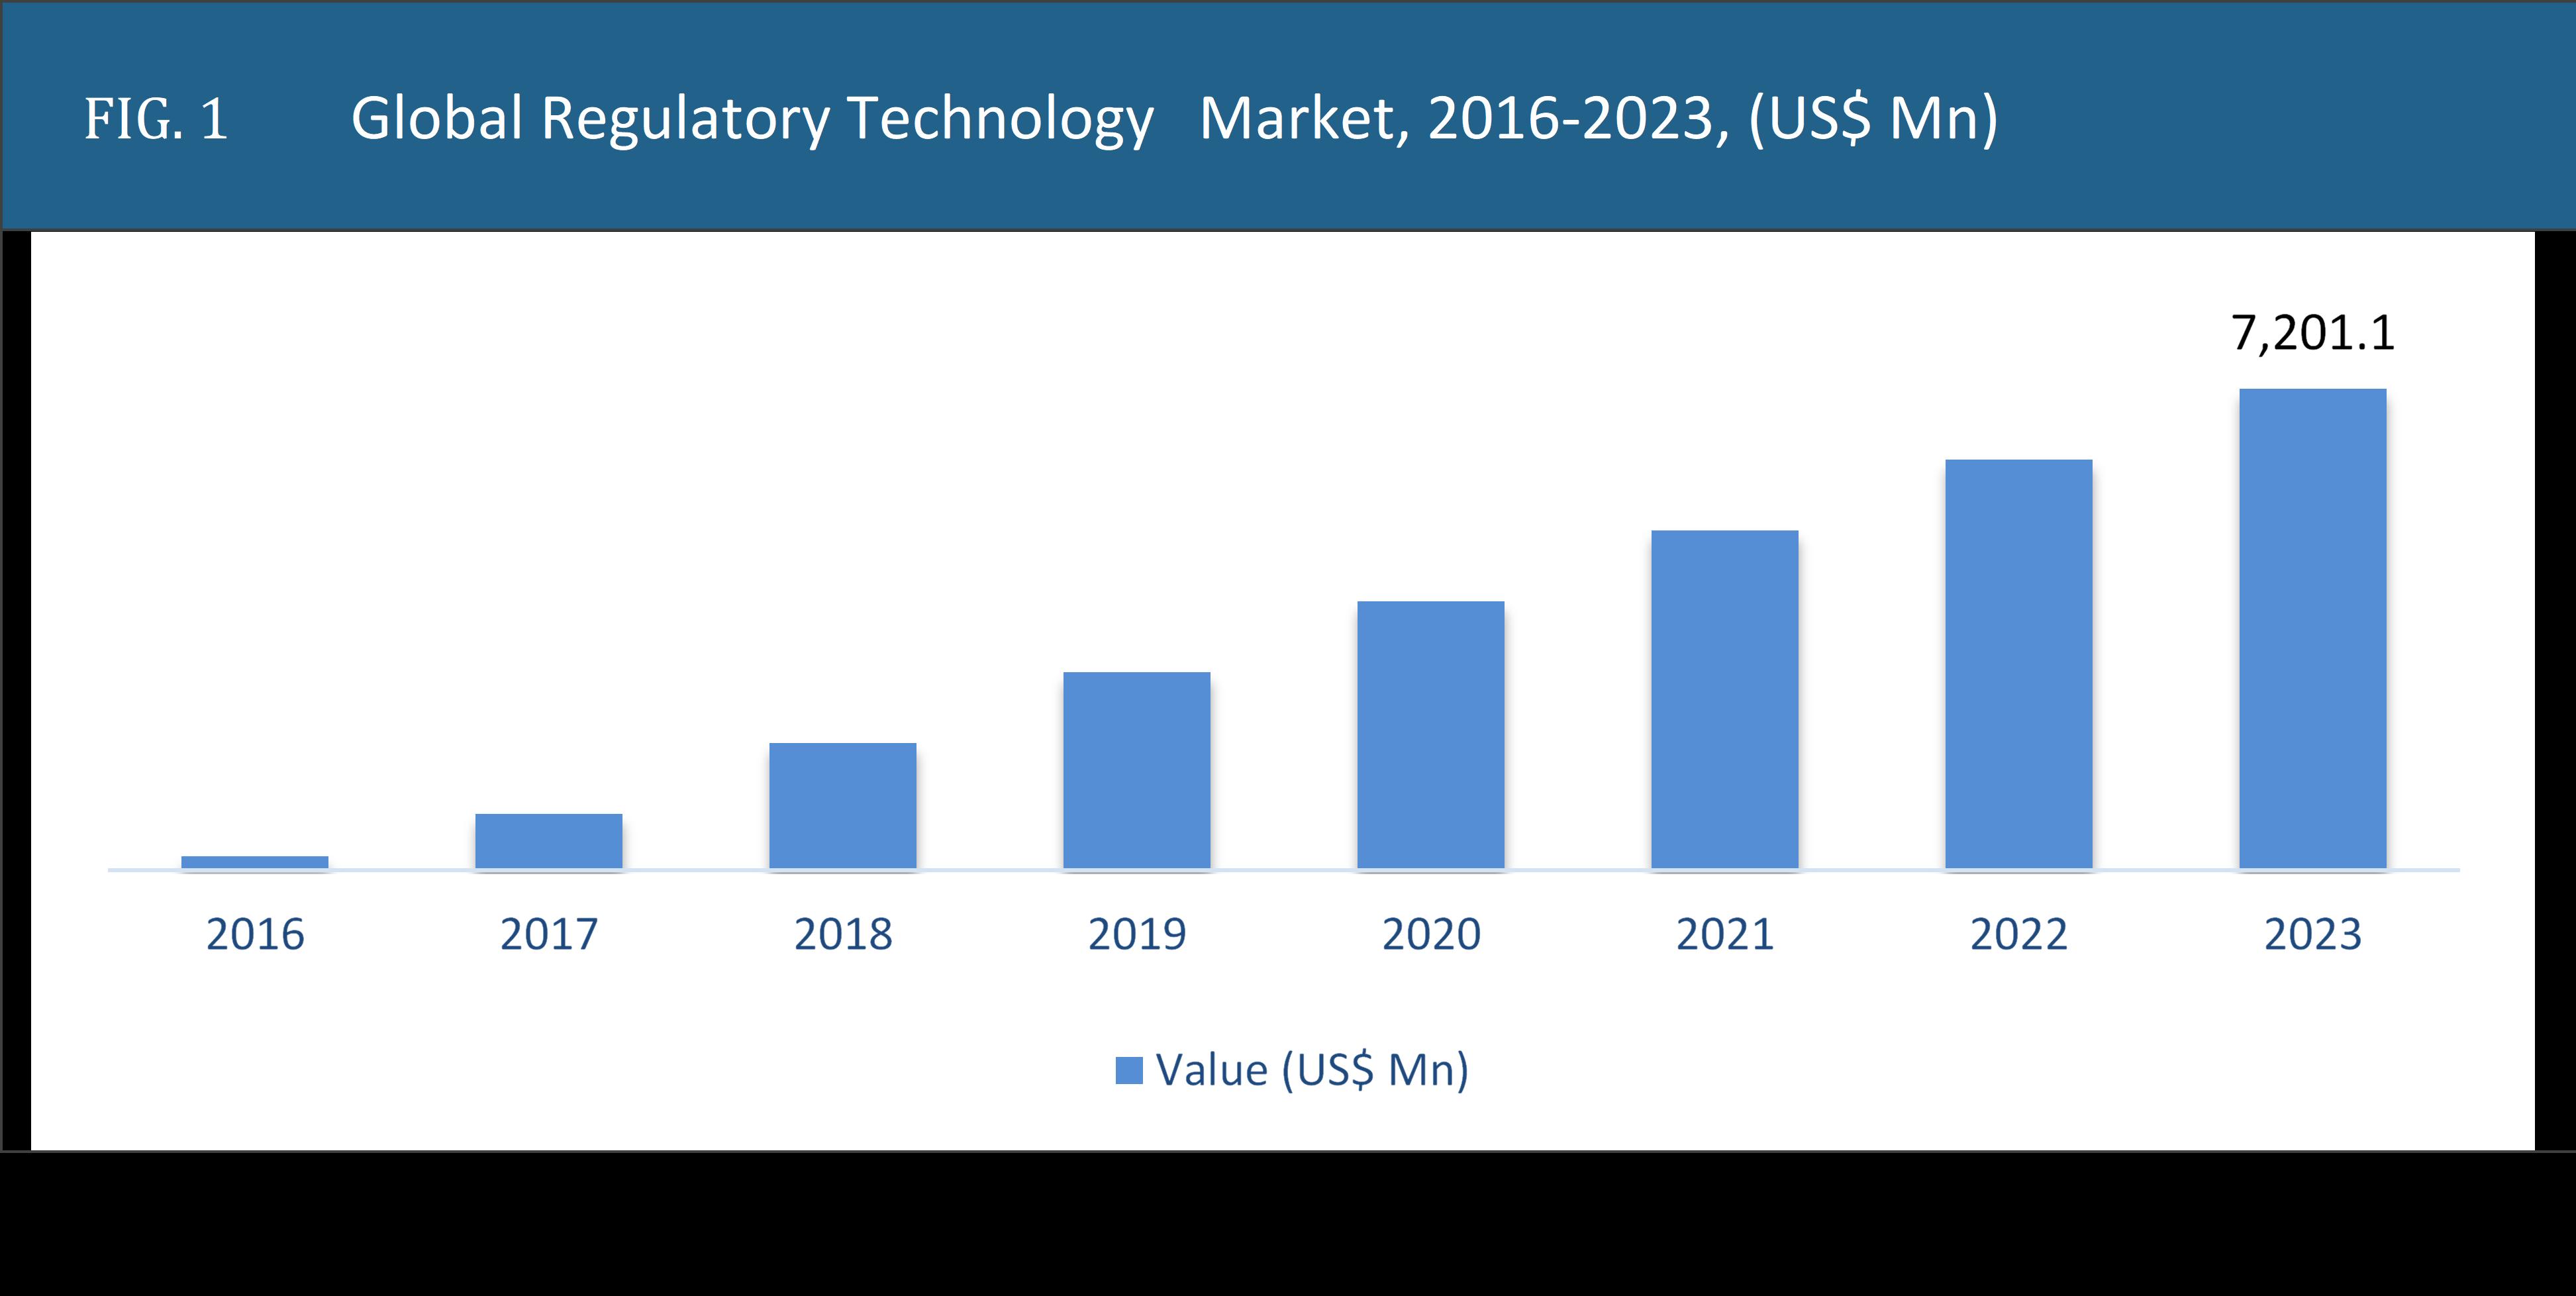 Regulatory Technology Market